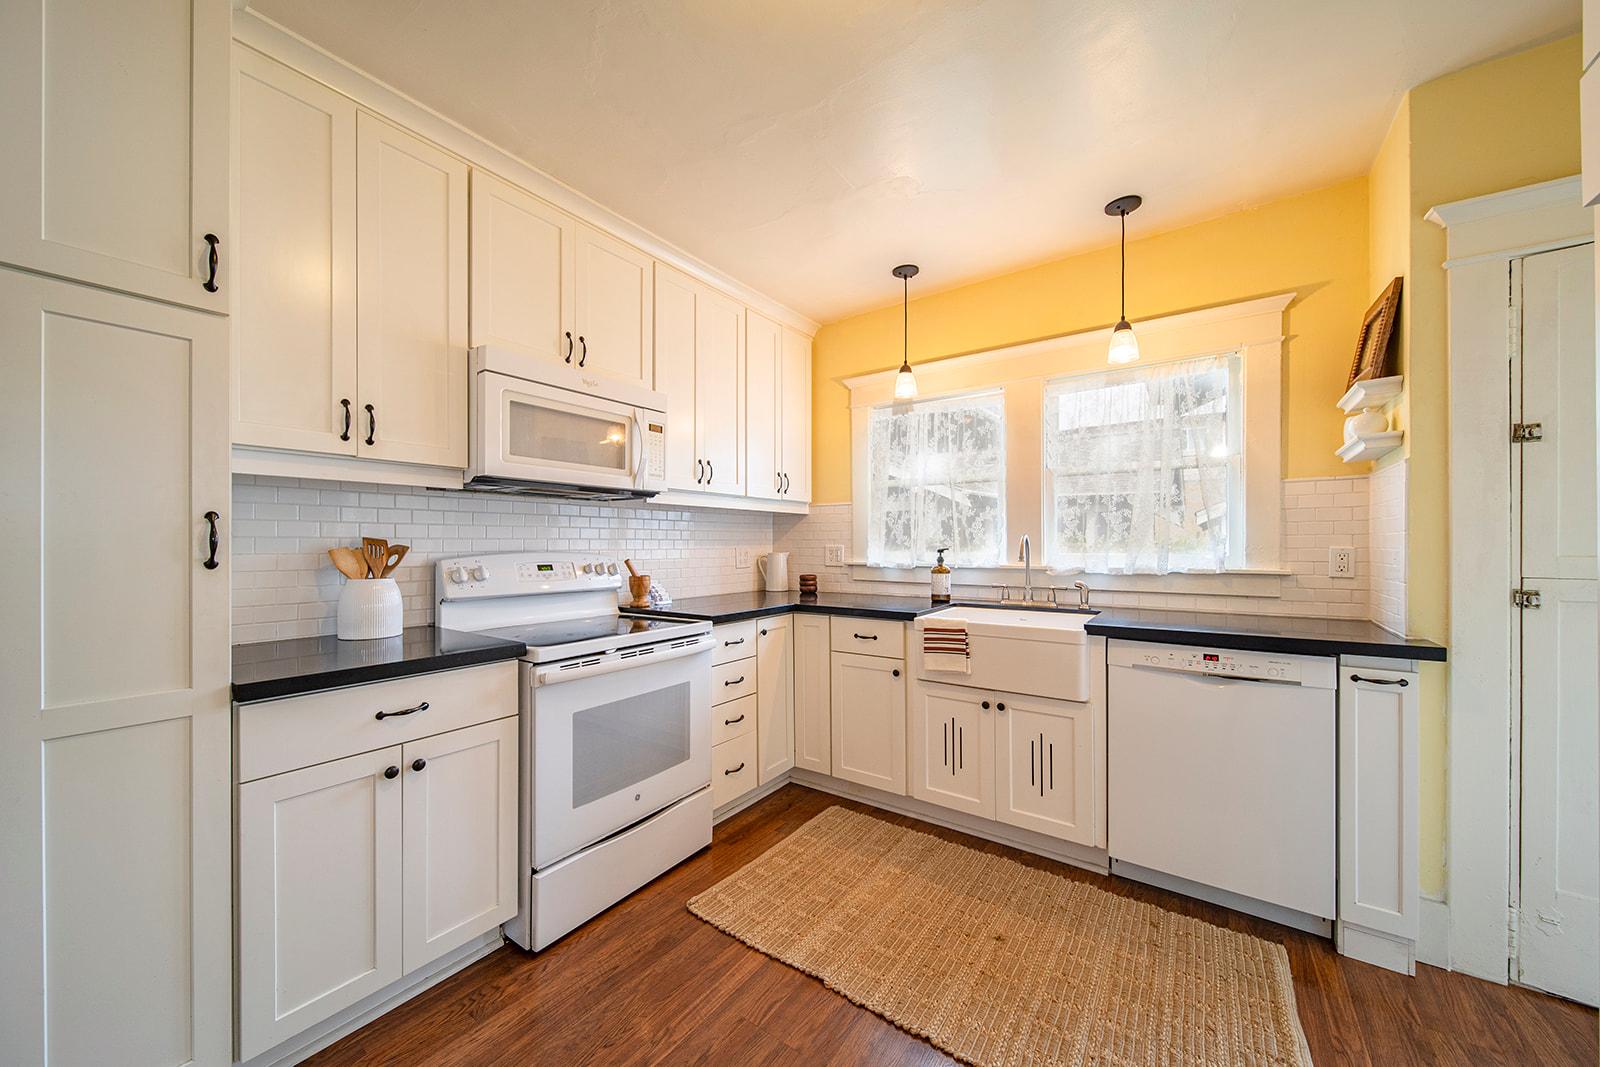 Decluttering for Sale Success Blog - Staged Kitchen